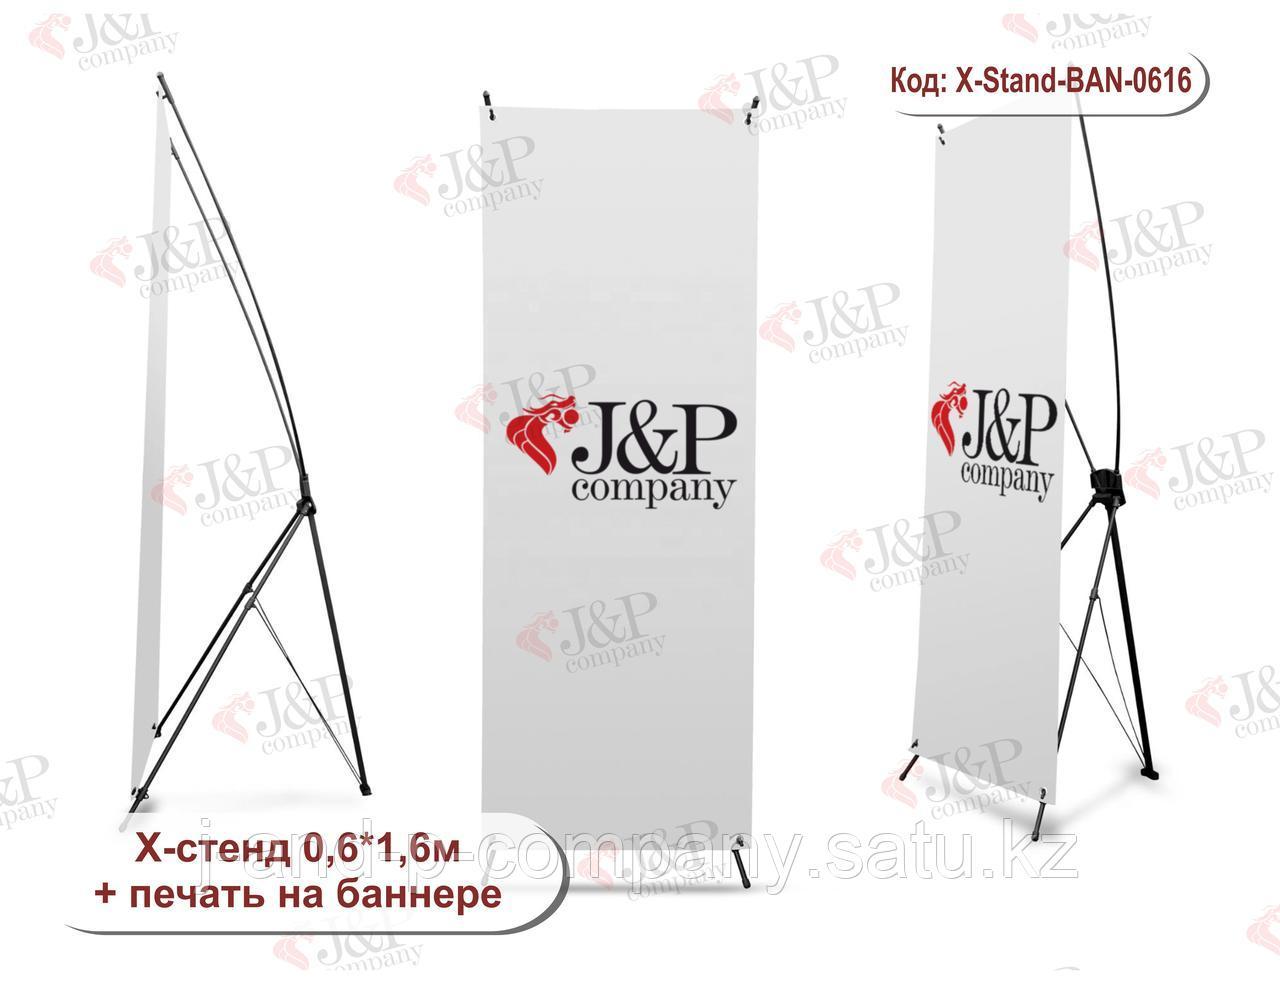 X-Стенд (Паучок) + Баннер 0,6х1,6м.